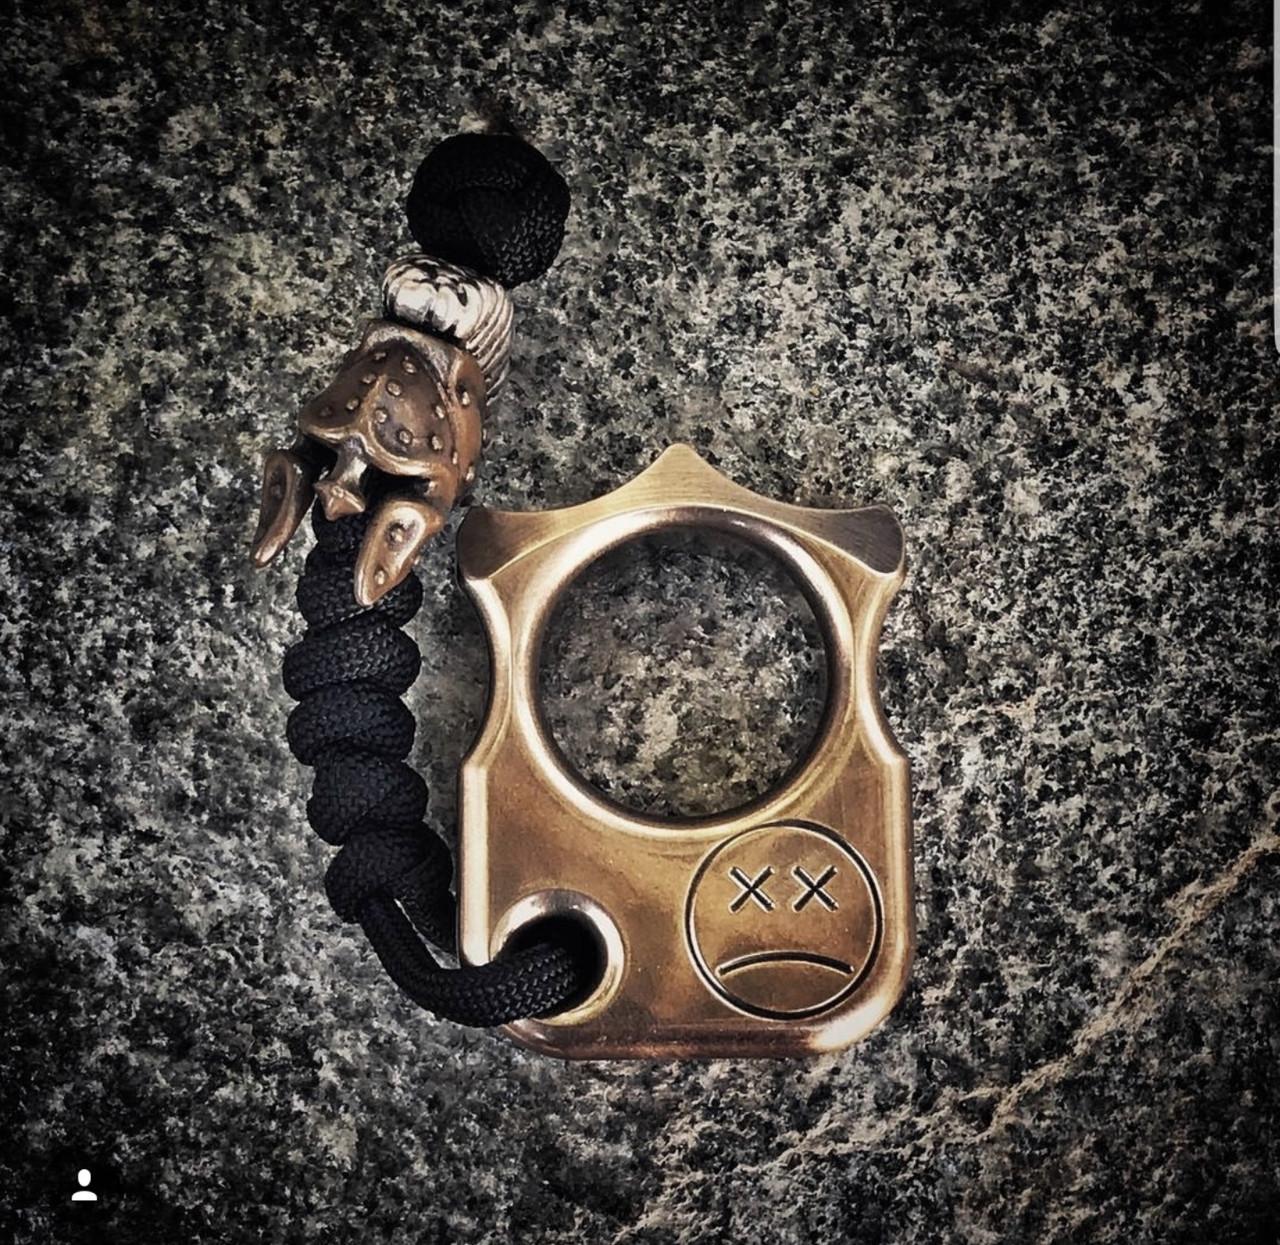 Кастет Брелок SFK Афранкарт #03 | Кастет на один палец  | Afrankart EDC KNUCK D16 - Сopper by Andy Frankart